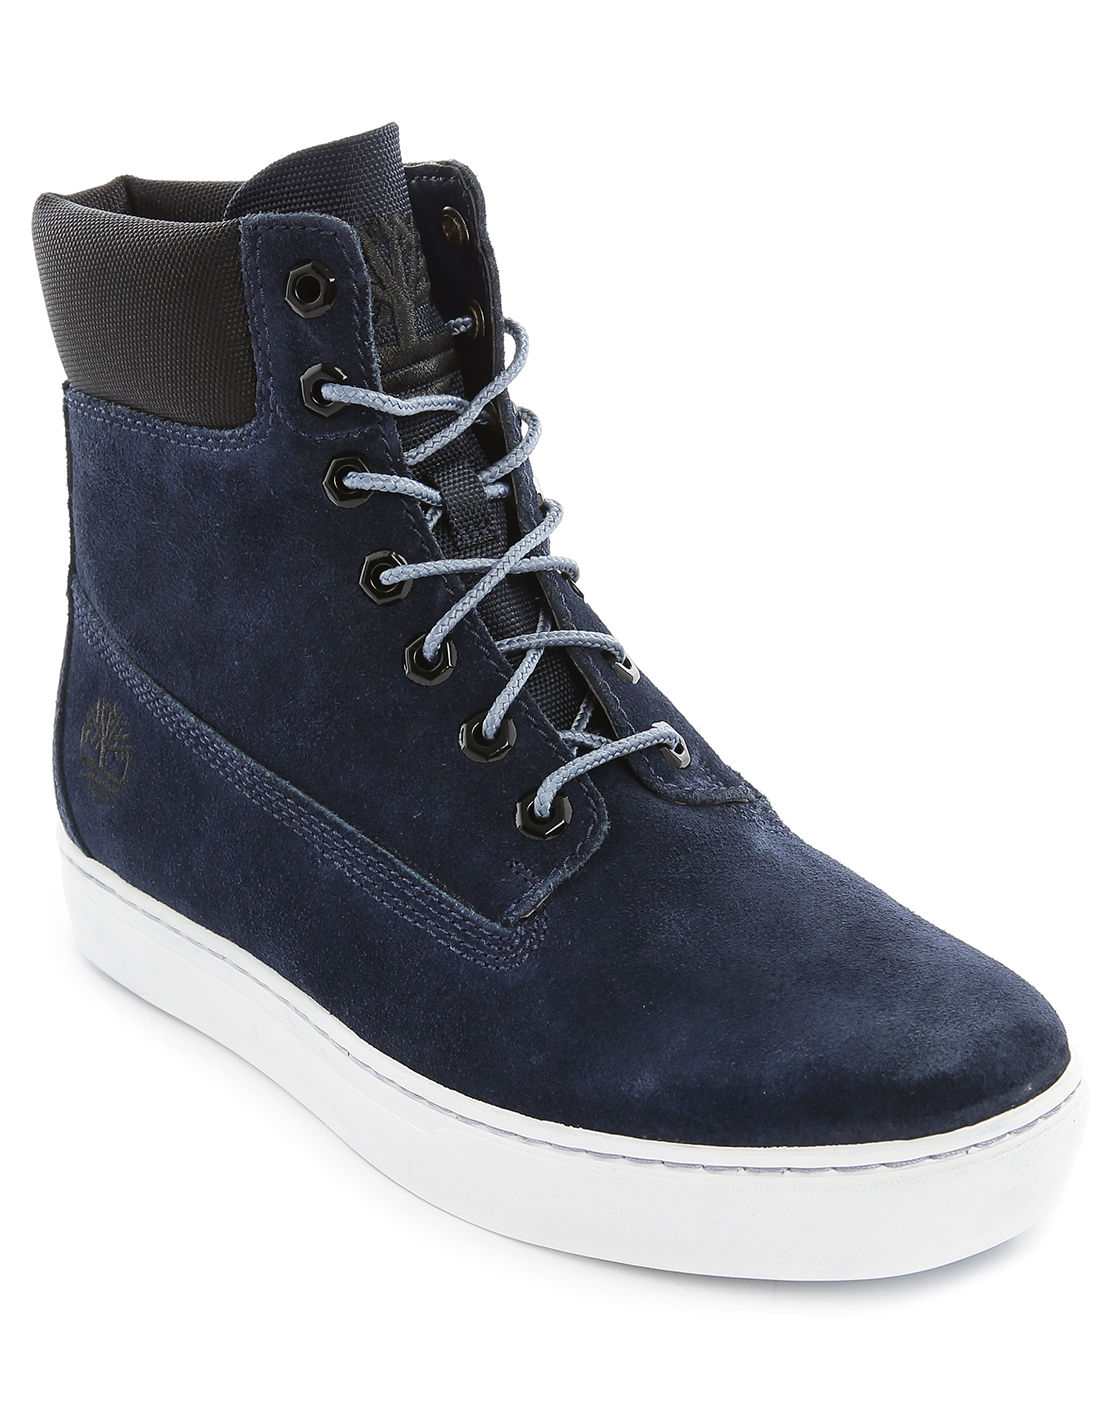 timberland navy cupsole hi suede sneaker in blue for men. Black Bedroom Furniture Sets. Home Design Ideas